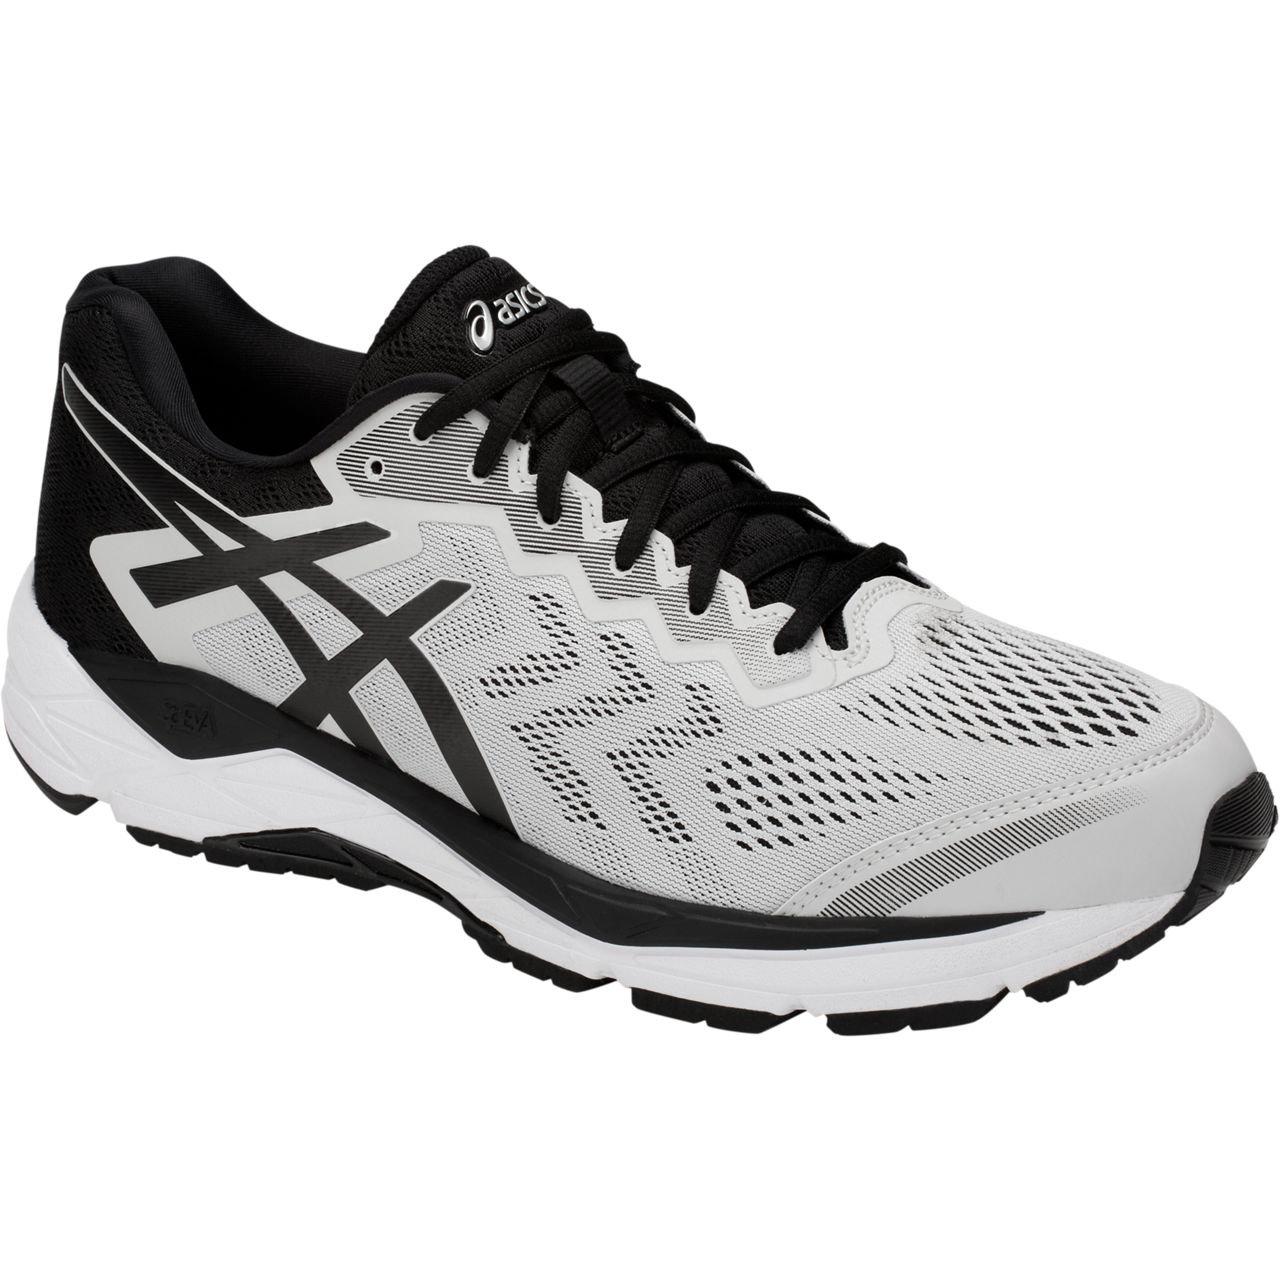 ASICS Men's Gel-Fortitude 8 Running Shoe B077MDLGPD 7 EE US|Glacier Grey/Black